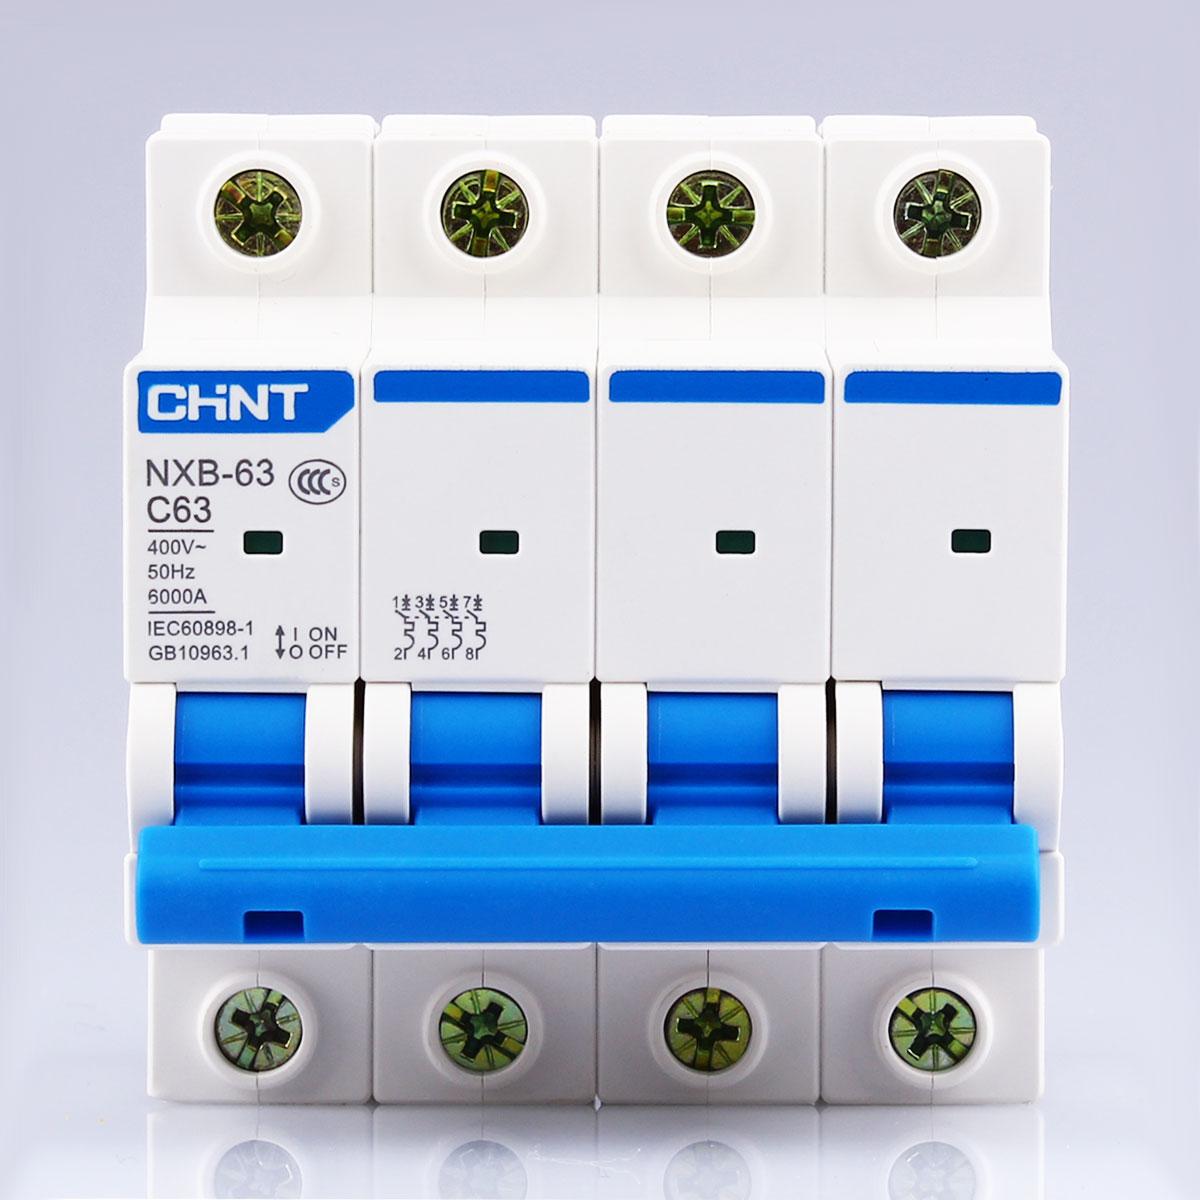 CHNT CHINT NXB-63 4P 1A 2A 3A 6A 10A 16A 20A 25A 32A 40A 63A 230V 380V Miniature Circuit breaker MCB NEW DZ47 цена